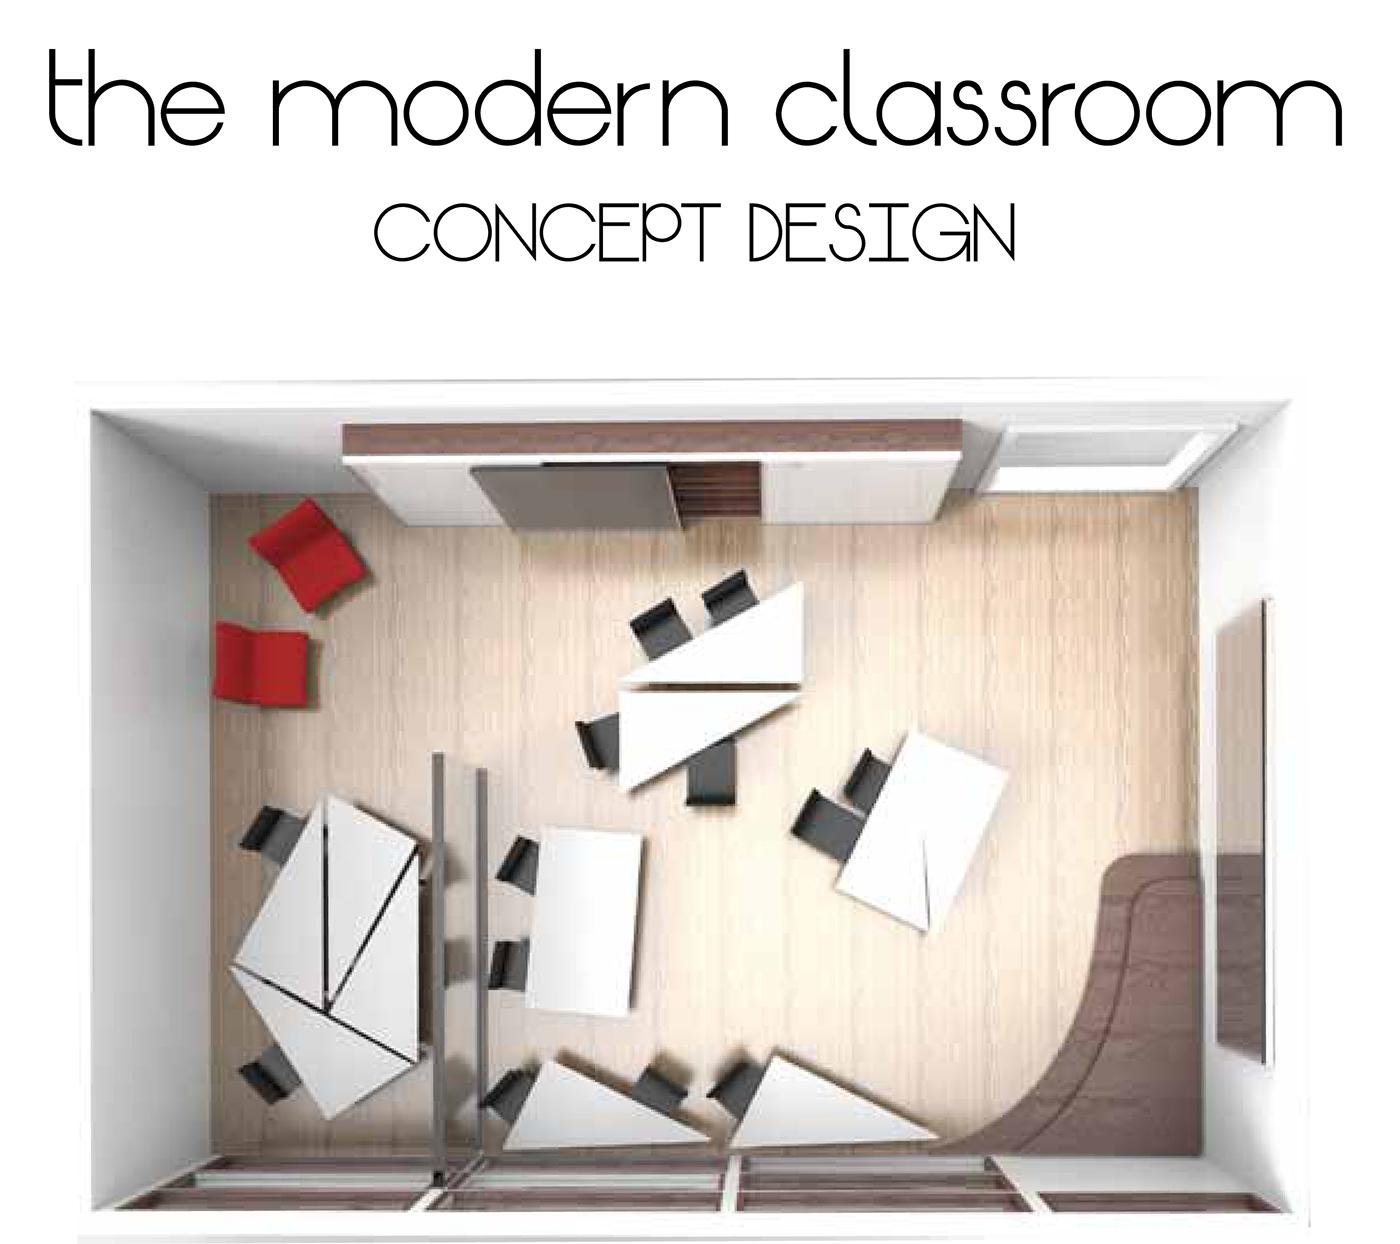 The Modern Classroom / Concept Design on Behance